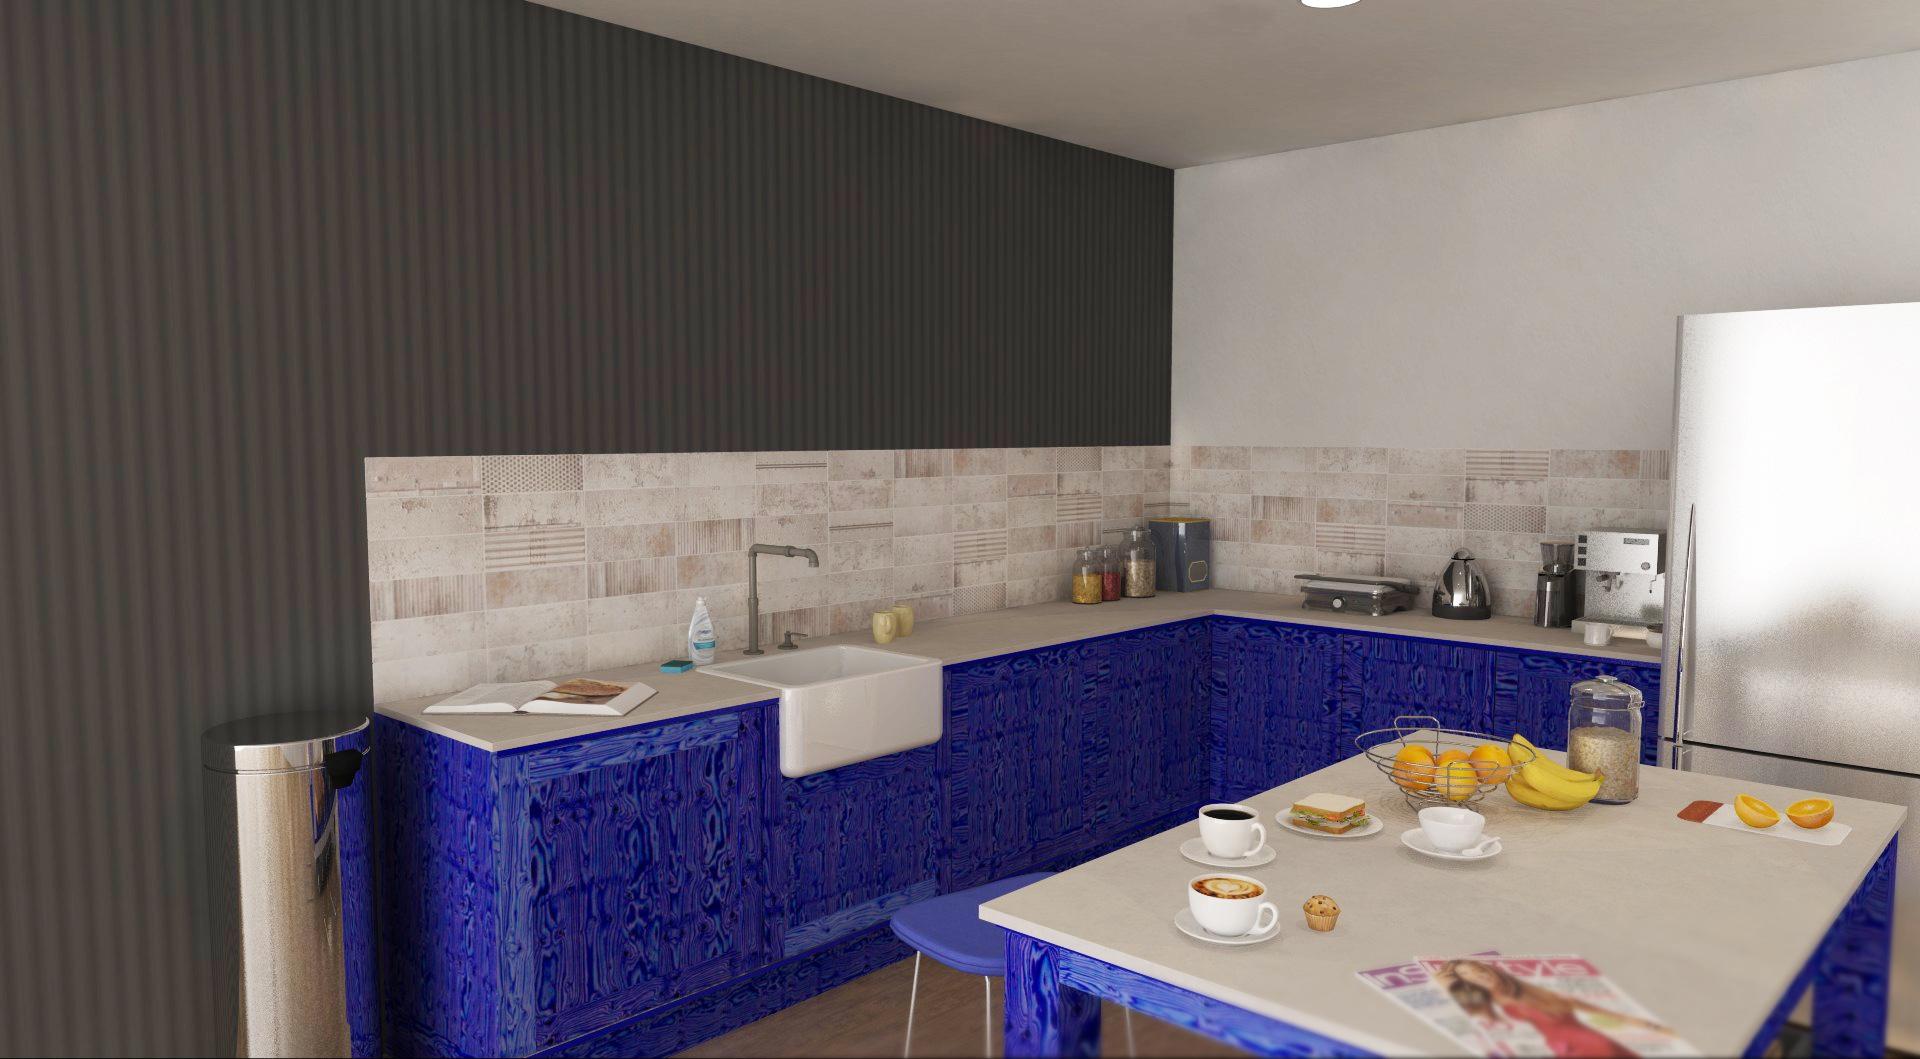 Newcastle Tile Co - Kitchen 01C.jpg